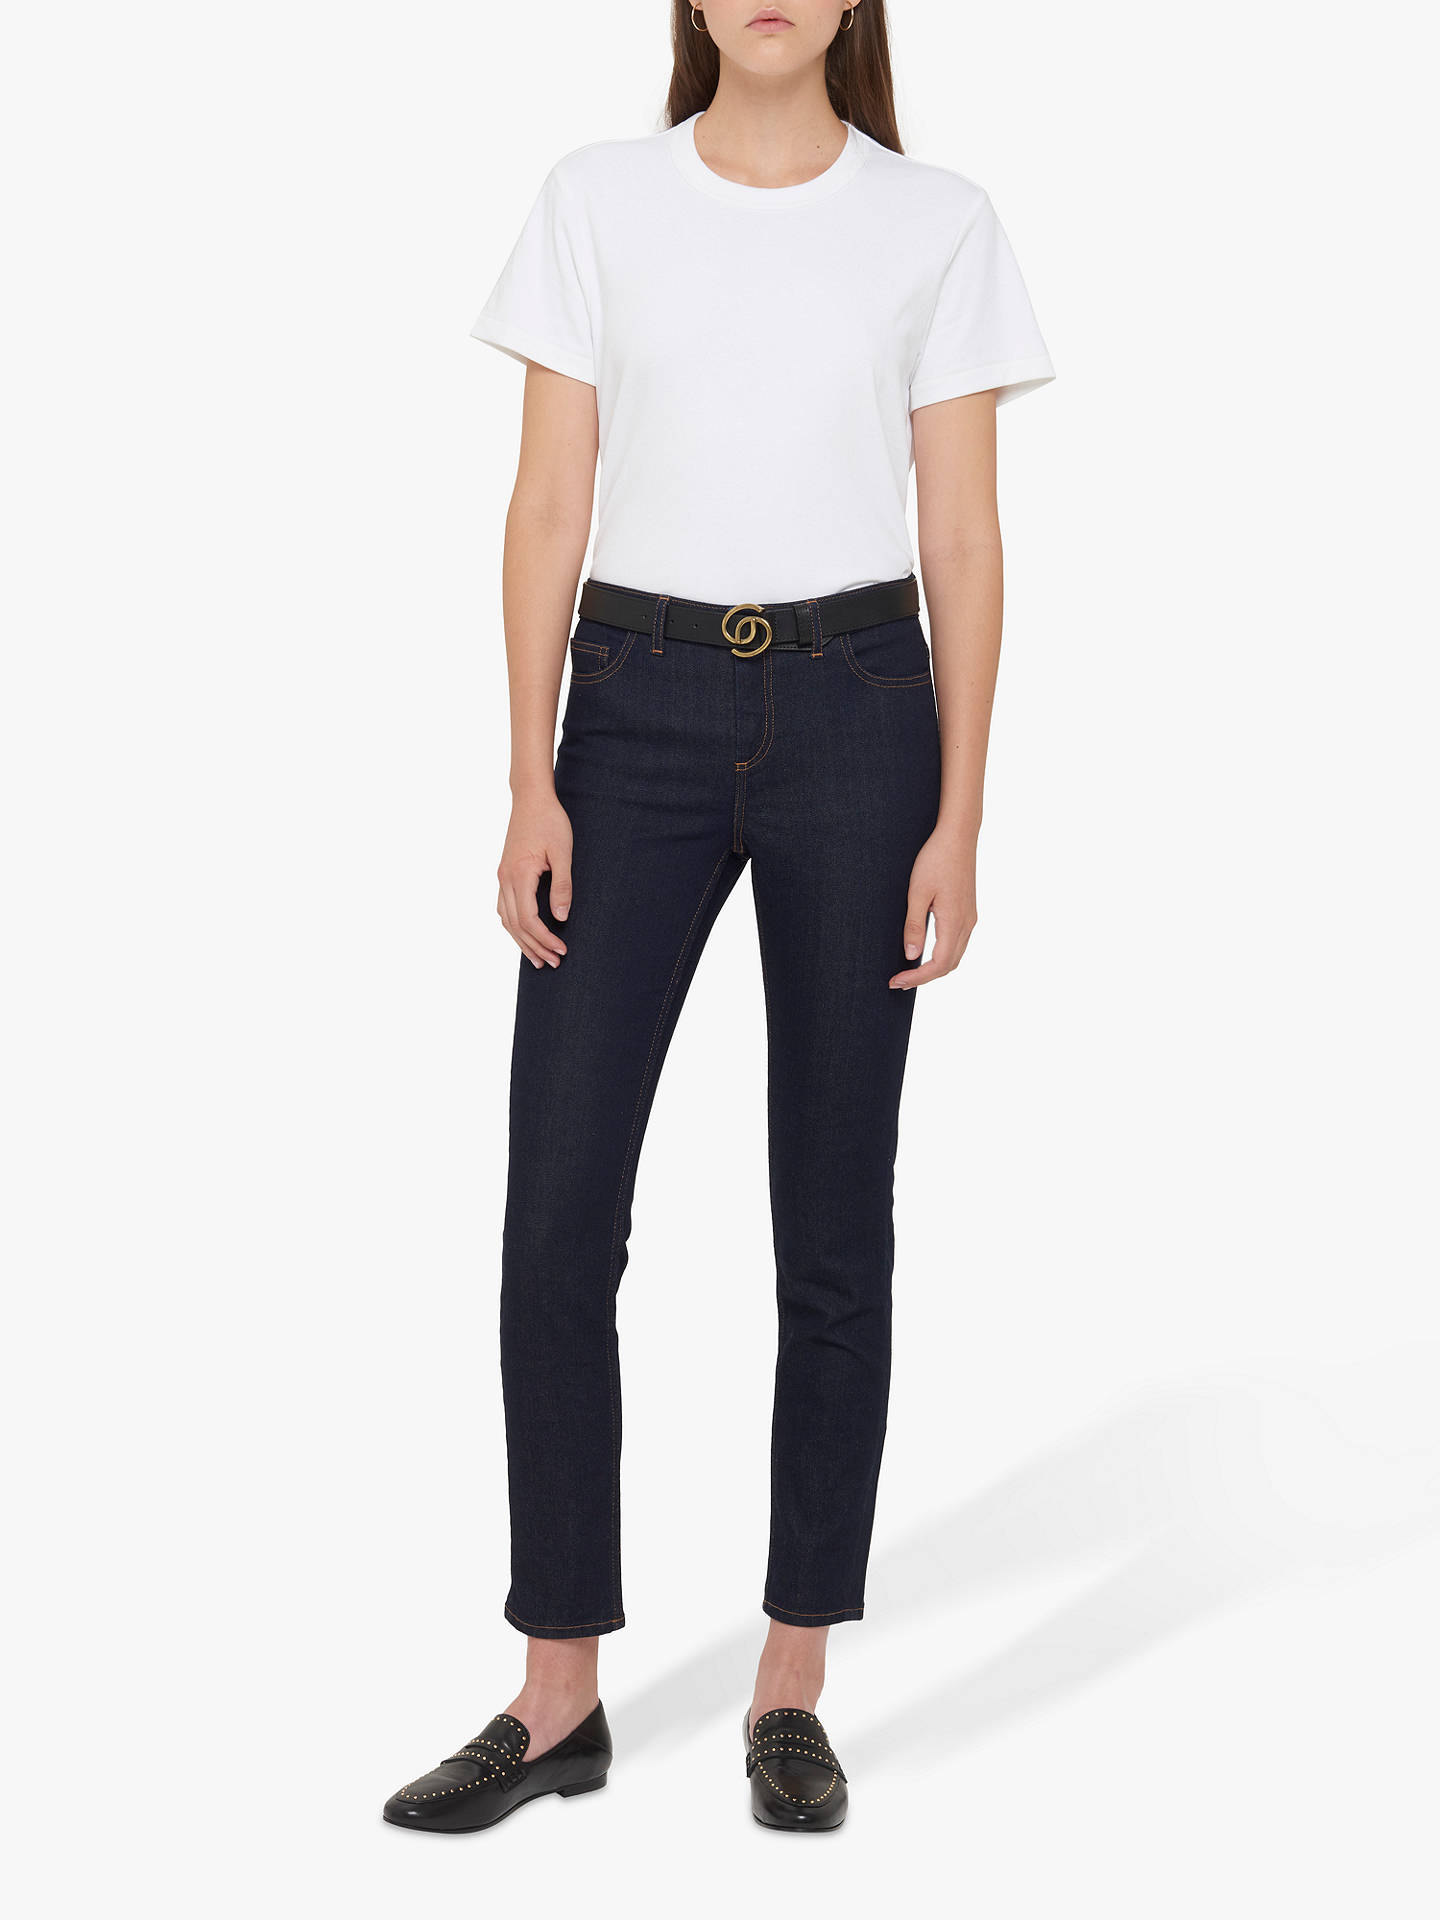 Gerard Darel Gail Jeans Blue At John Lewis Partners Shoes 12 Girl Buygerard Online